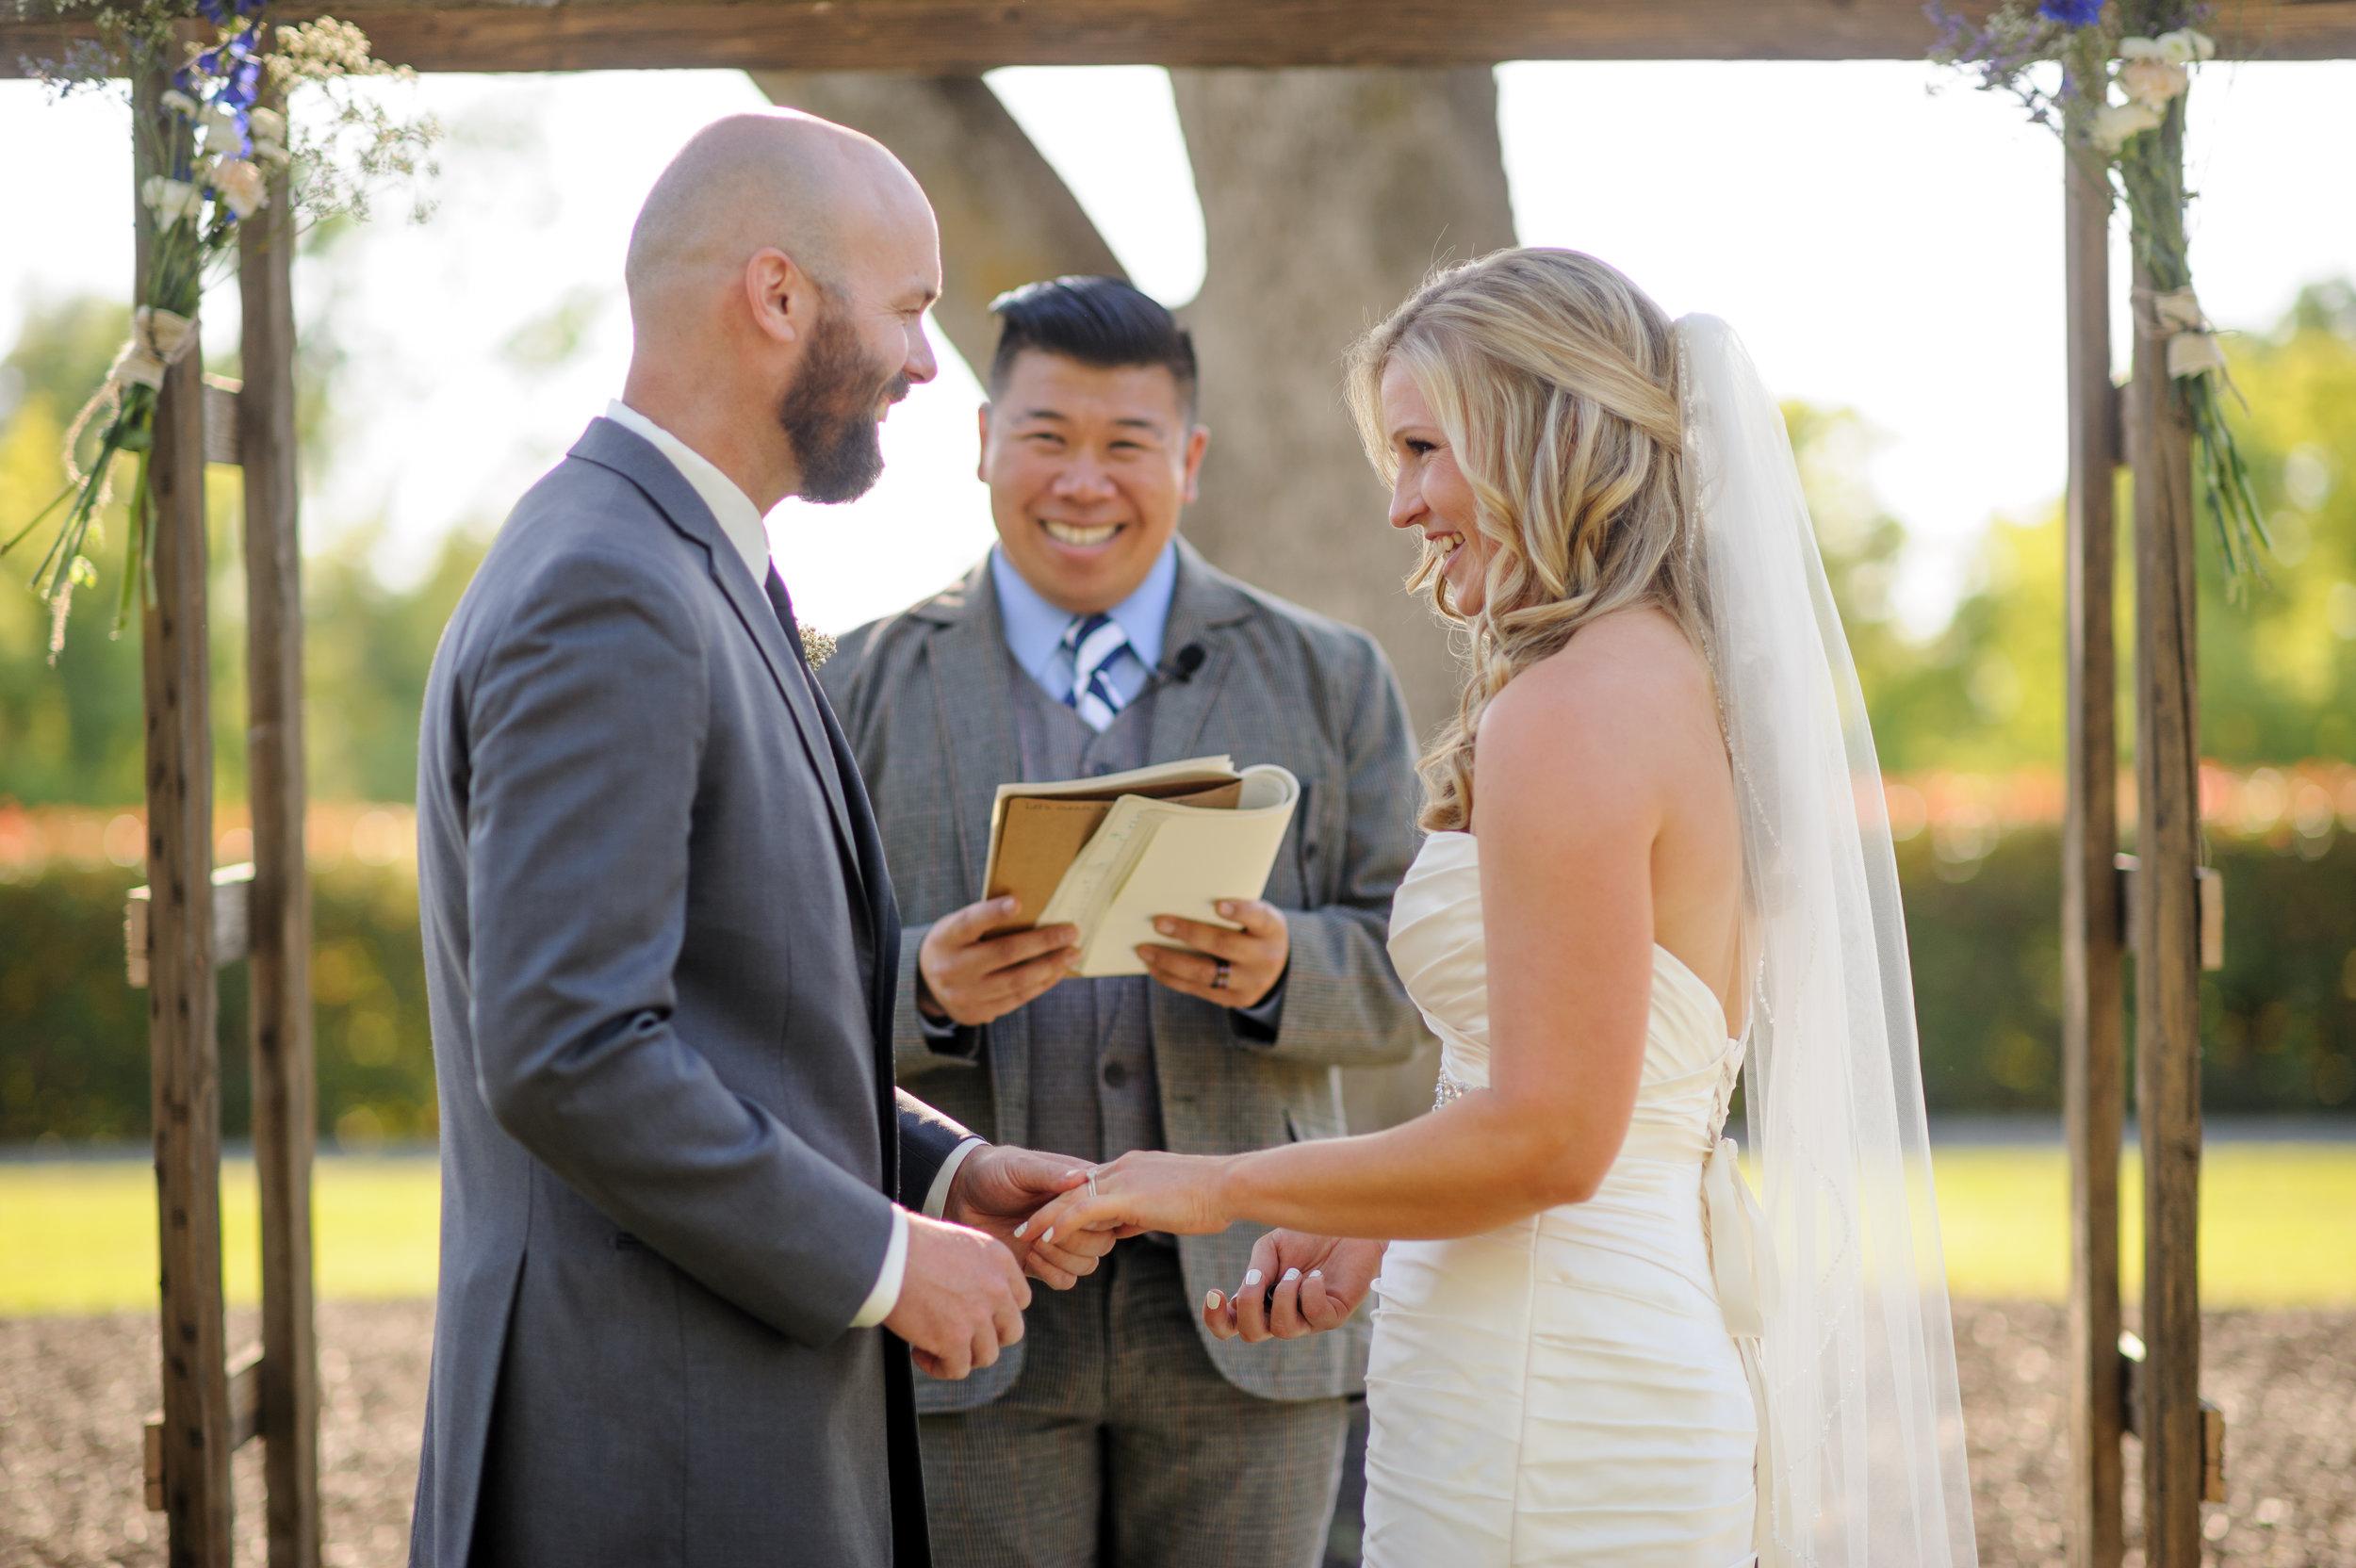 lindsey-alex-019-backyard-sacramento-wedding-photographer-katherine-nicole-photography.JPG